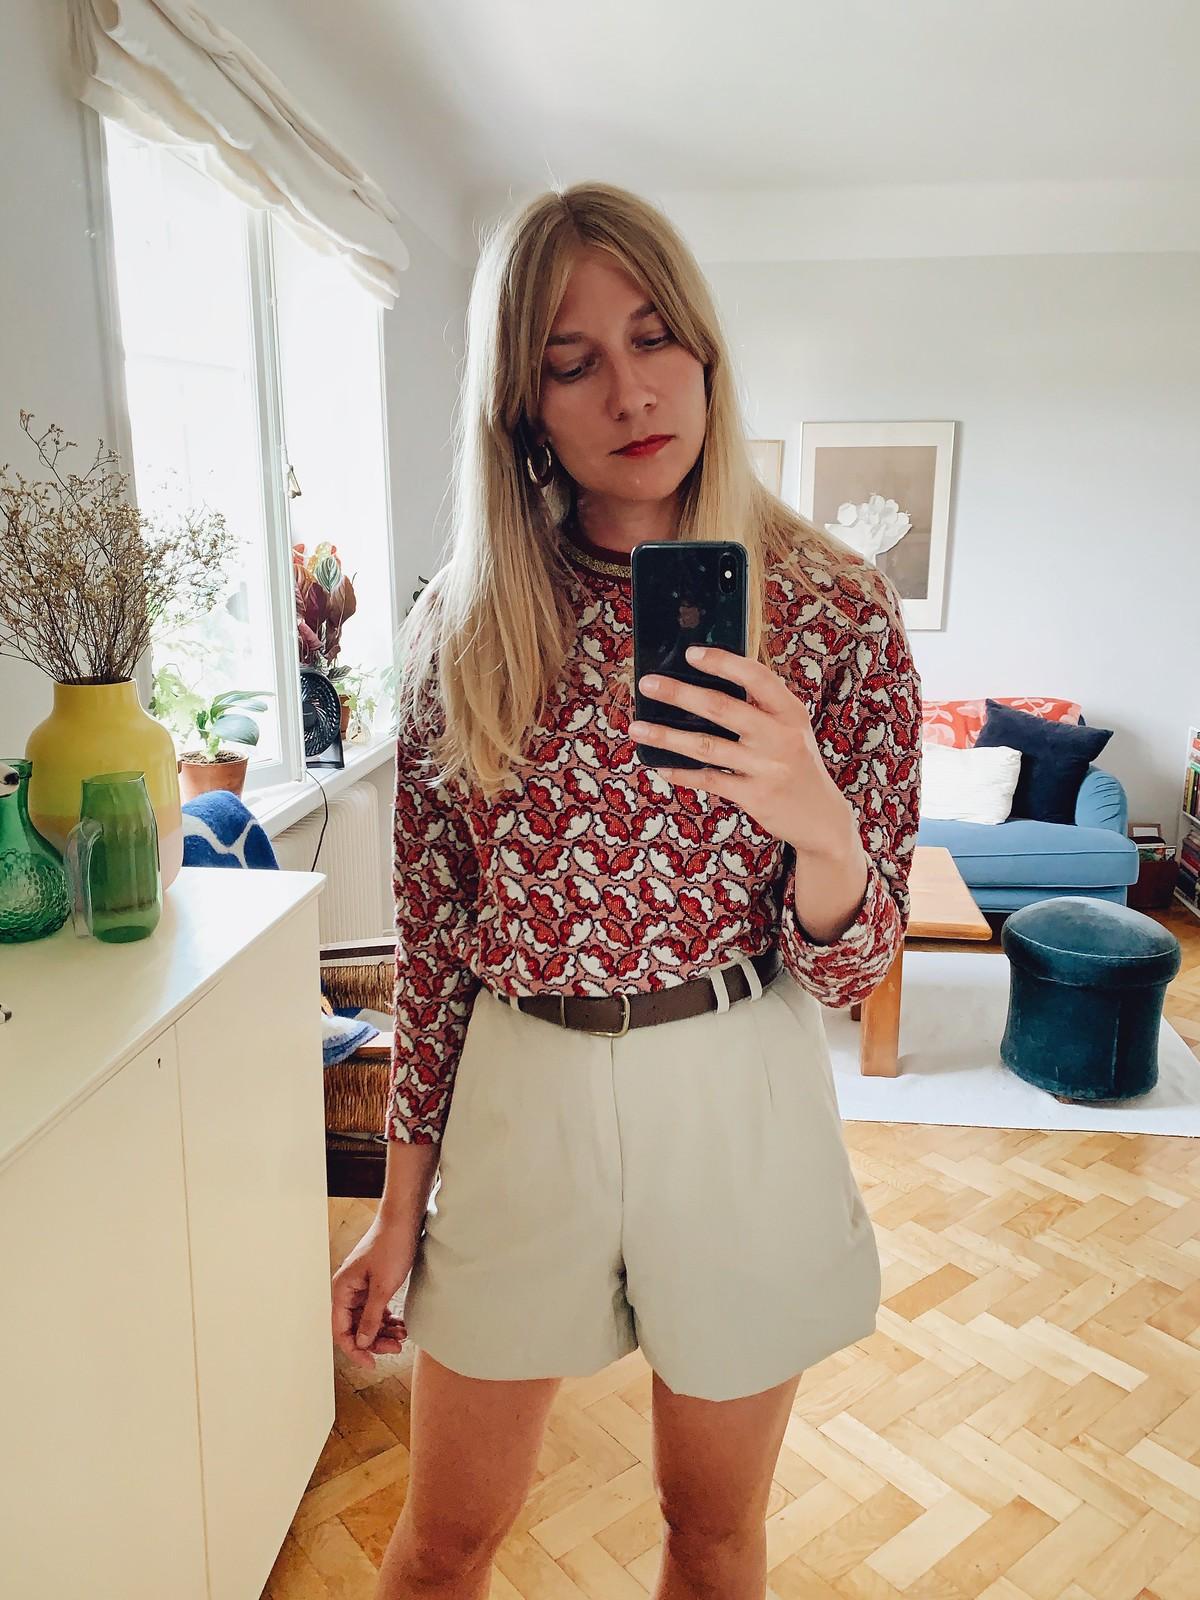 mönstrad tröja